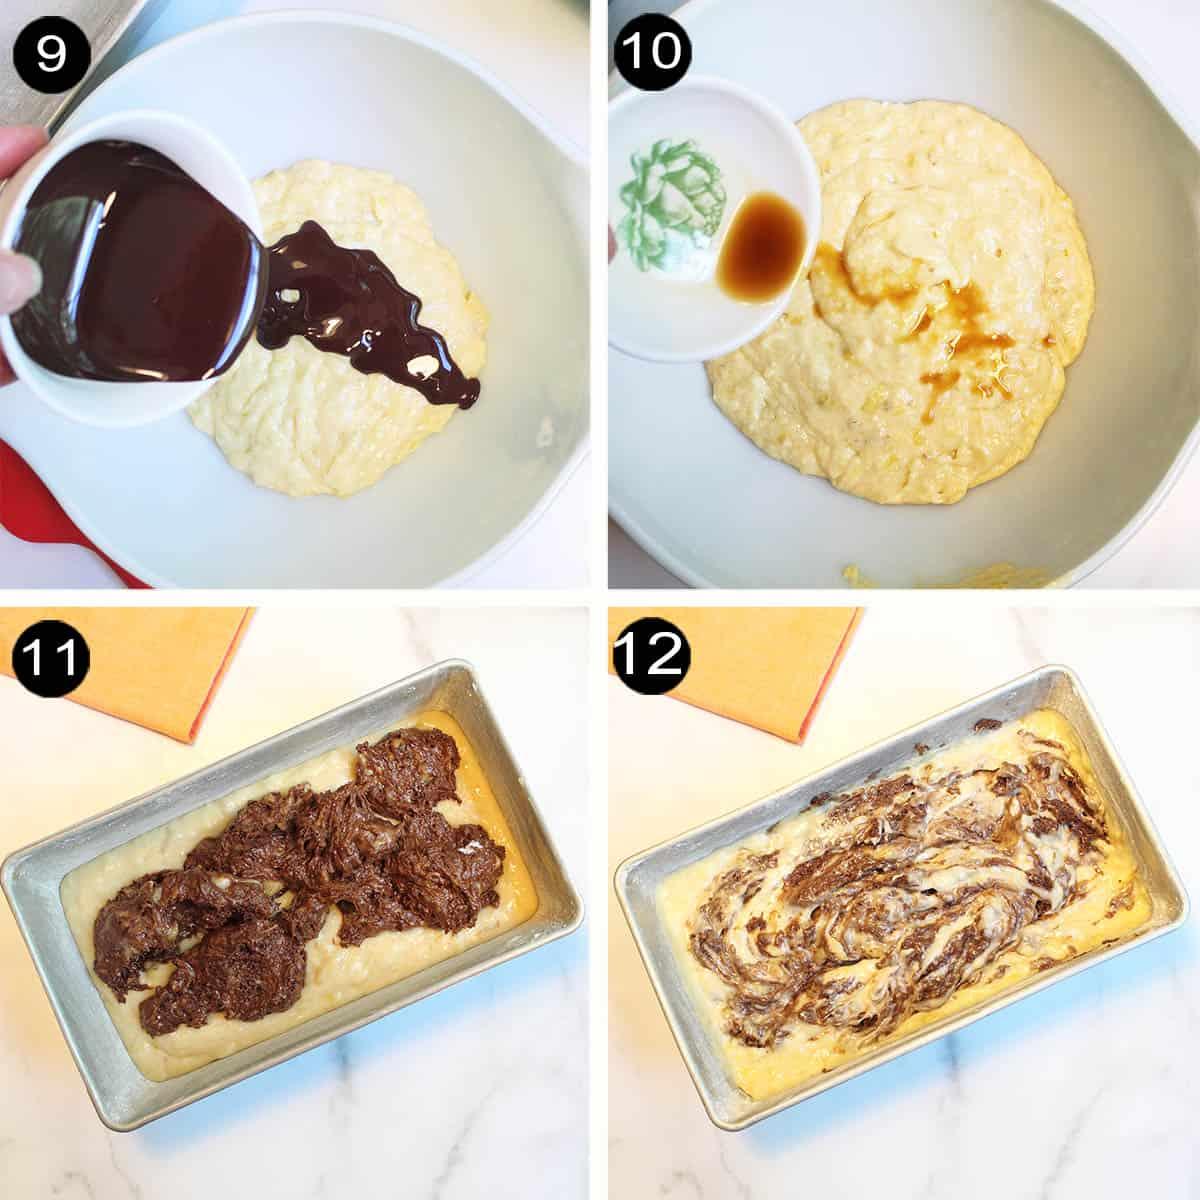 Steps 9-12 marbling banana bread.